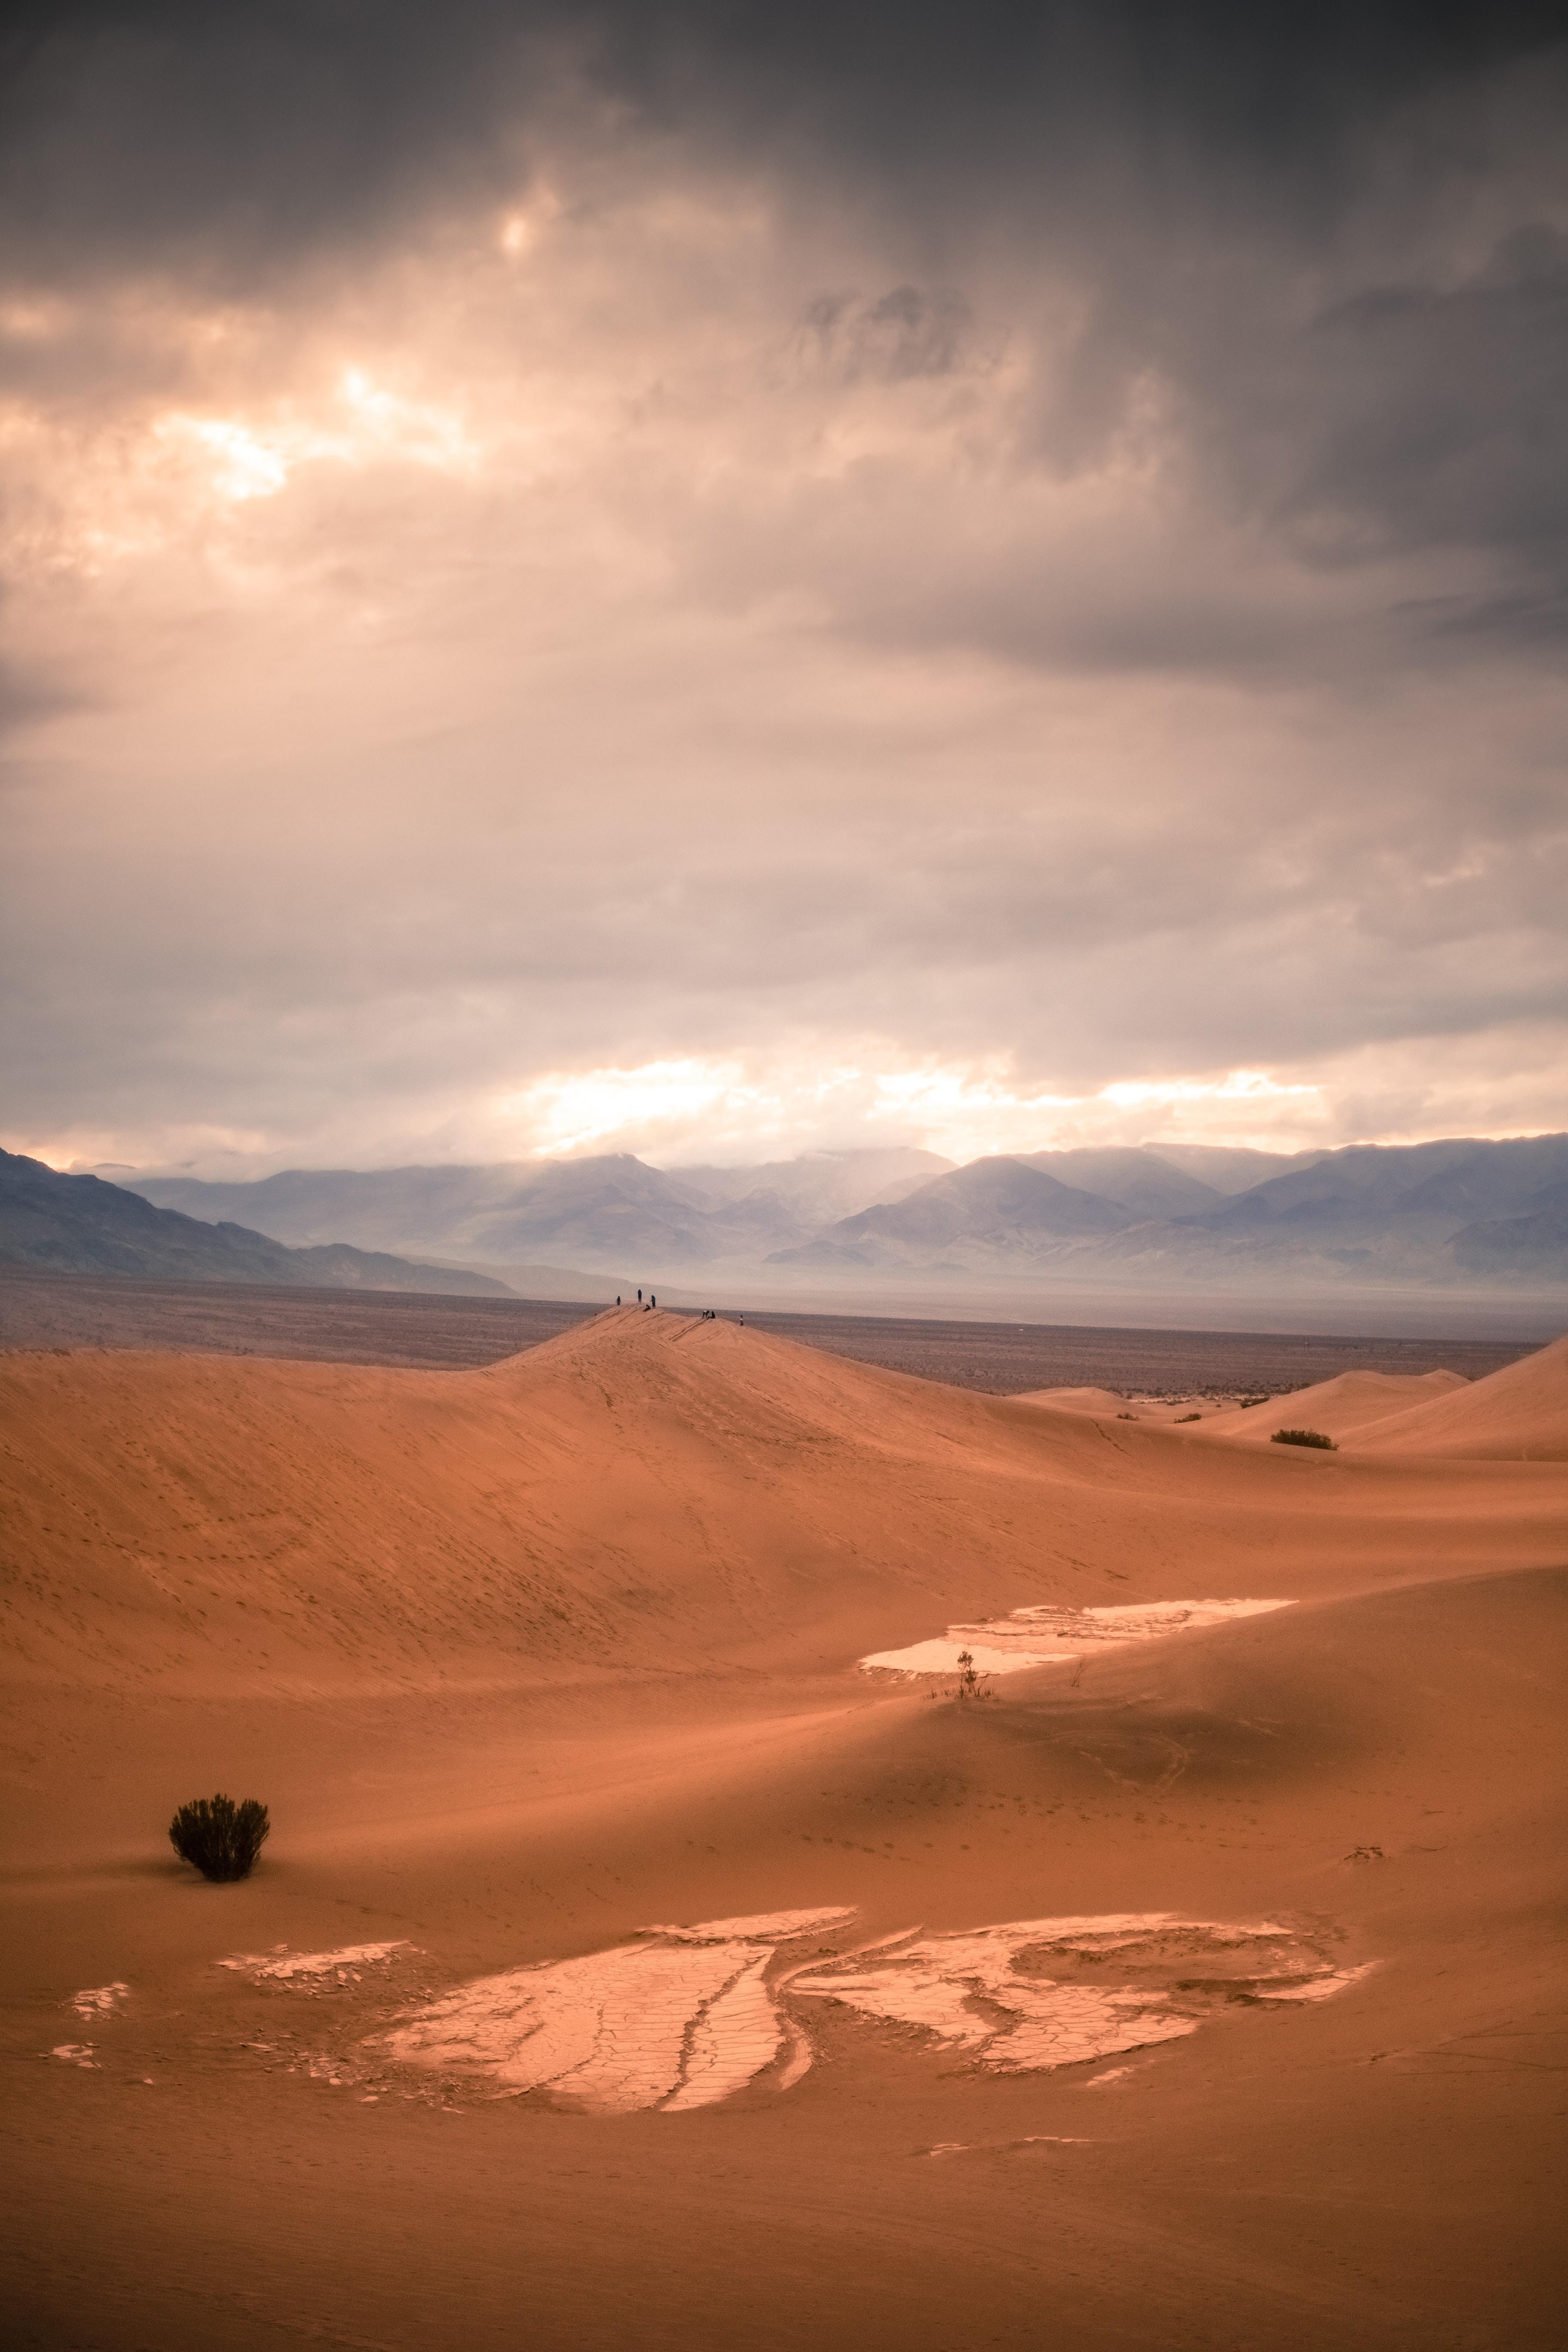 orange desert under gray cloudy sky at day